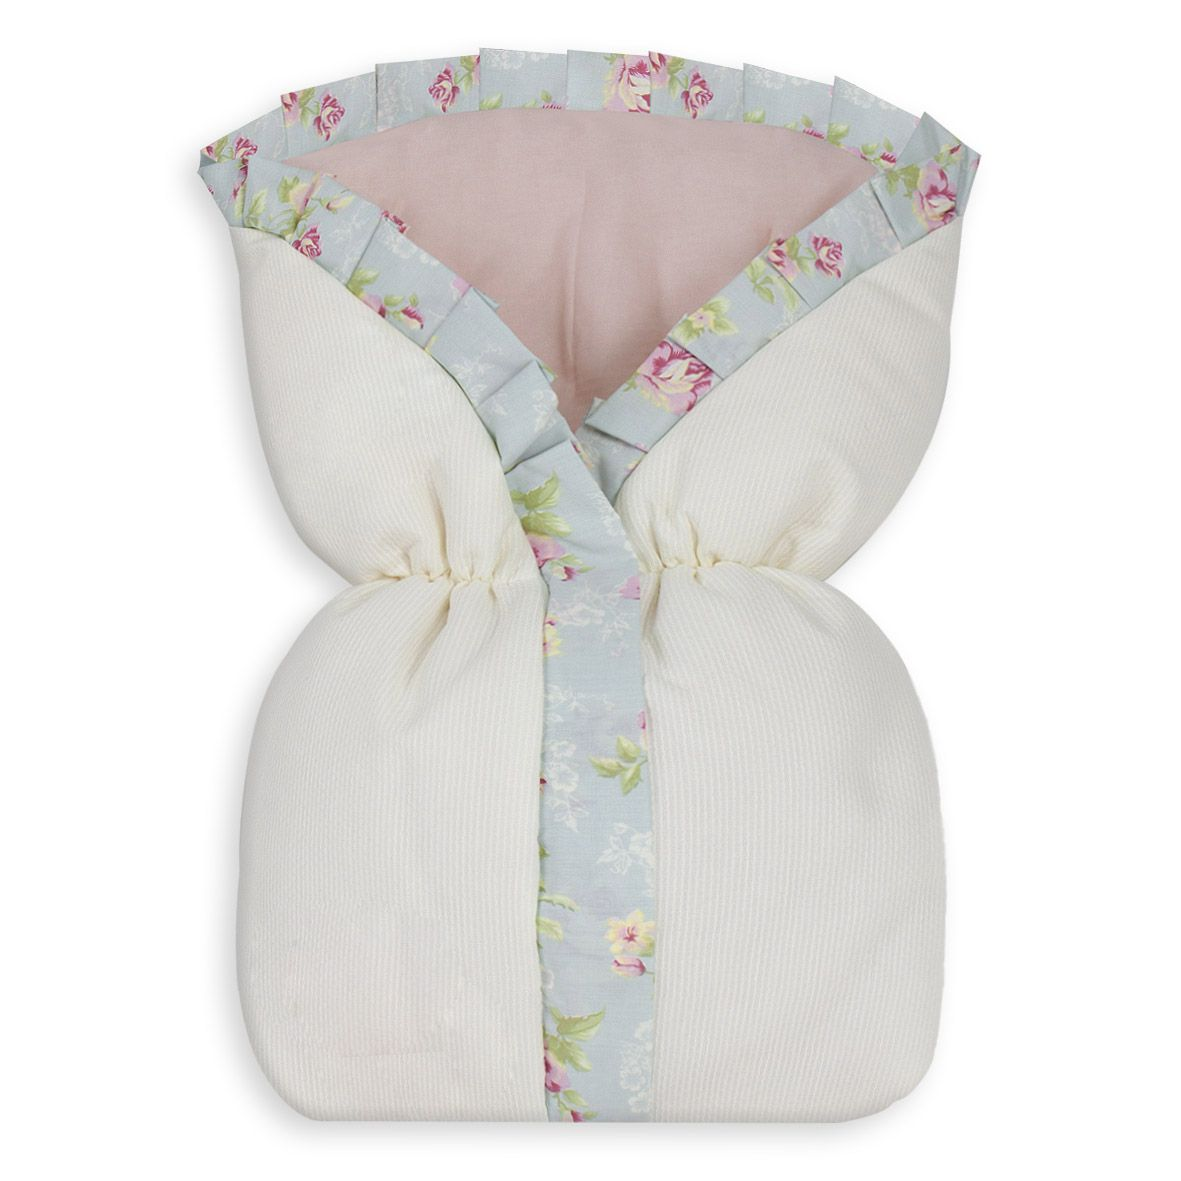 Saco de Bebê 100% Alg. - Ursa Realeza Floral